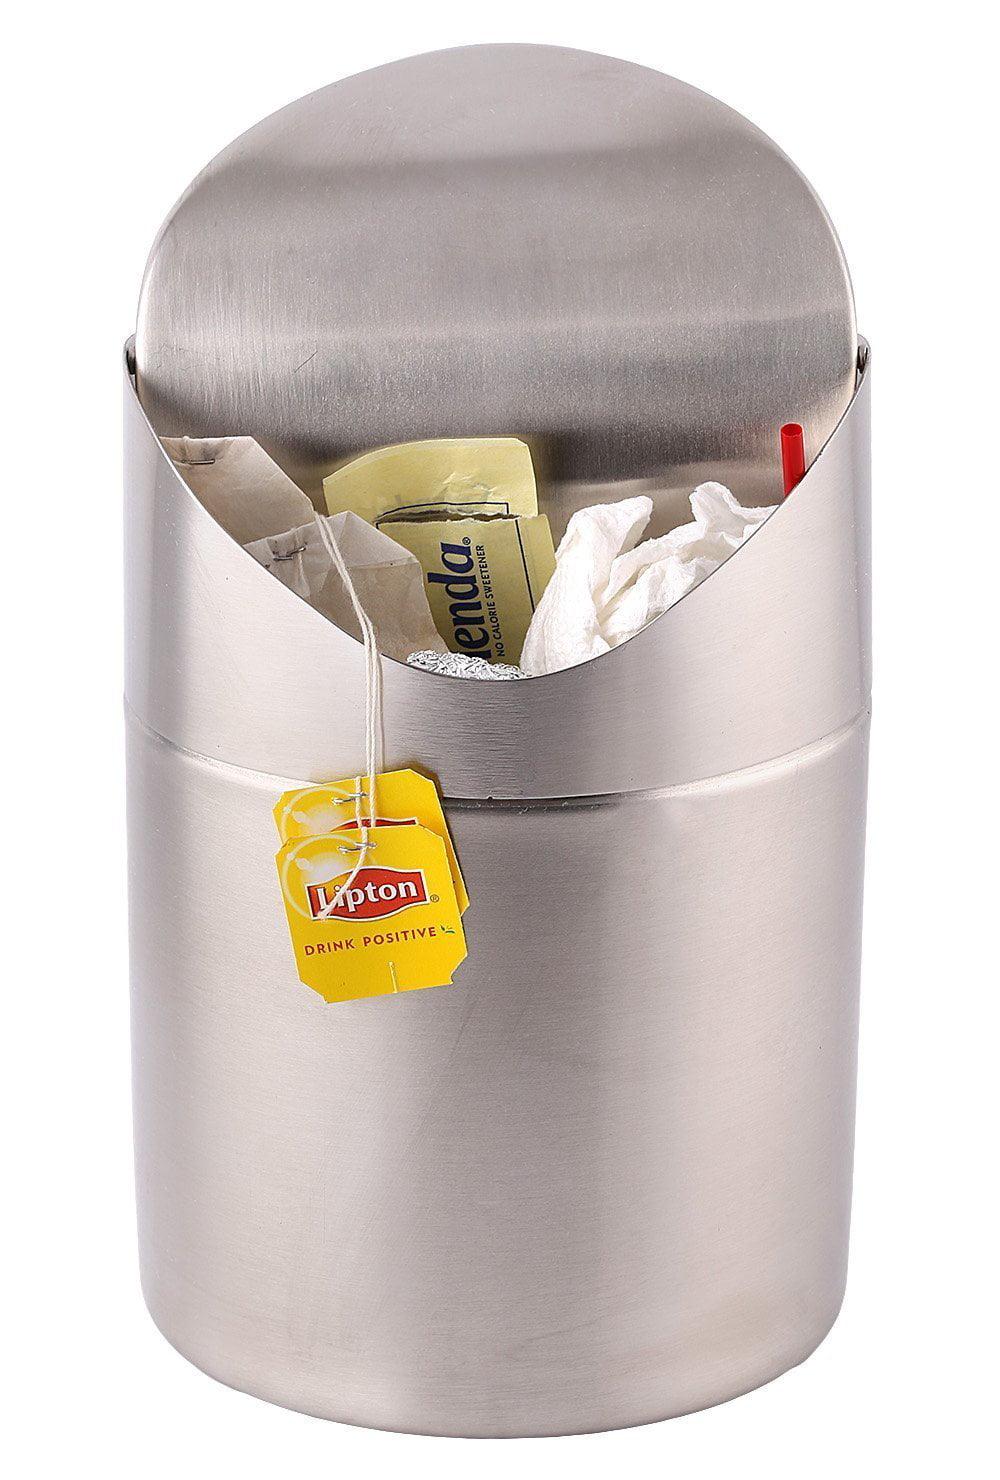 Estilo Mini Countertop Trash Can, Brushed Stainless Steel, Swing Top Trash Bin 1.5 L  ... by